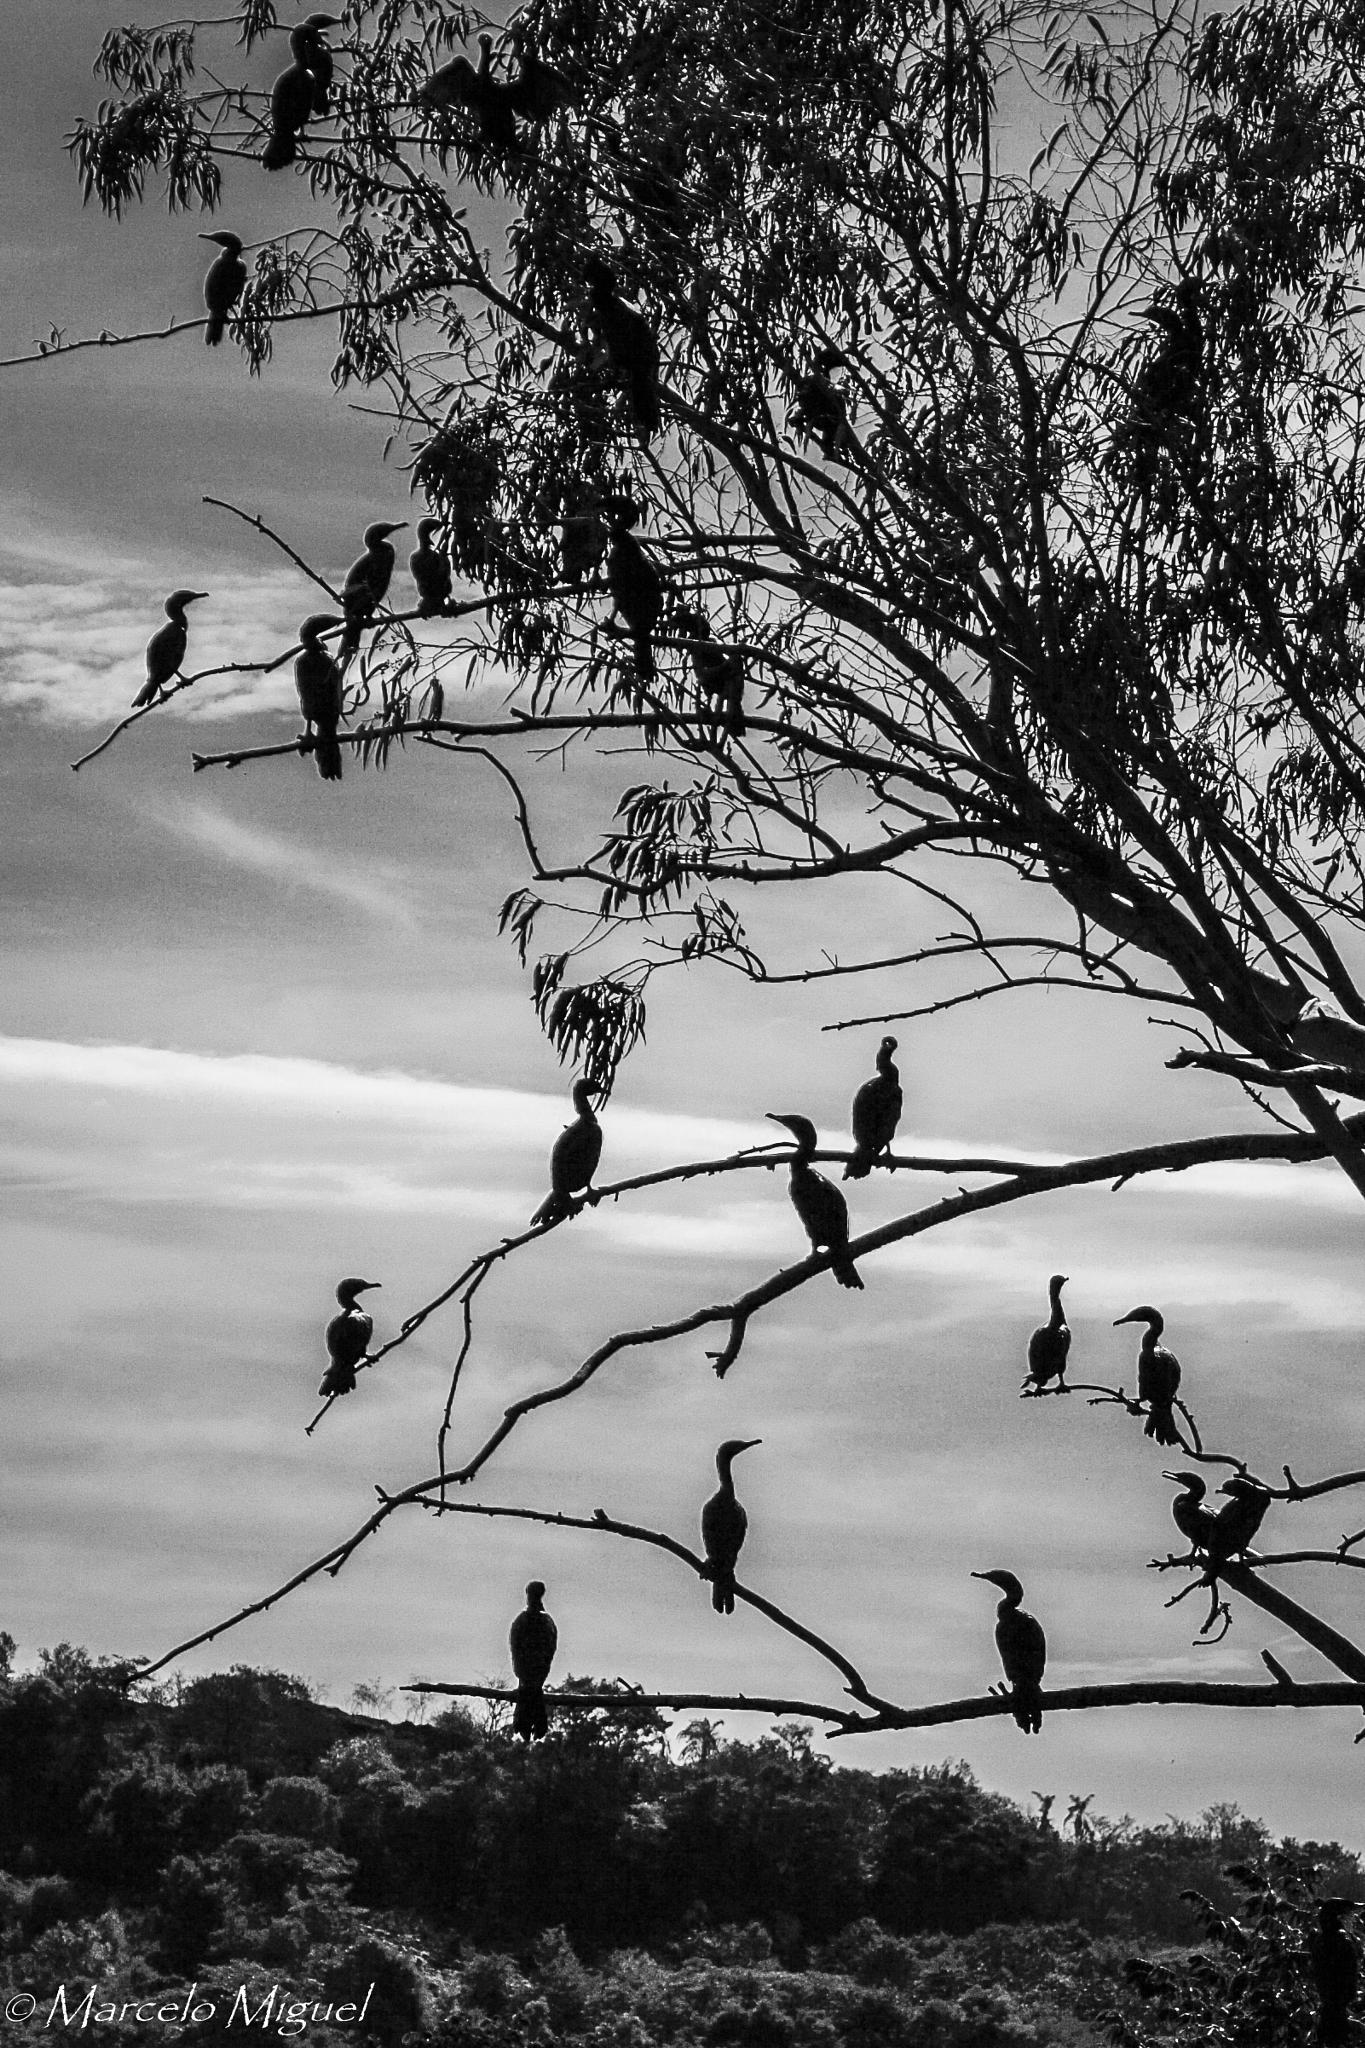 Birds at Ipanema Farm by marcelomiguel1967